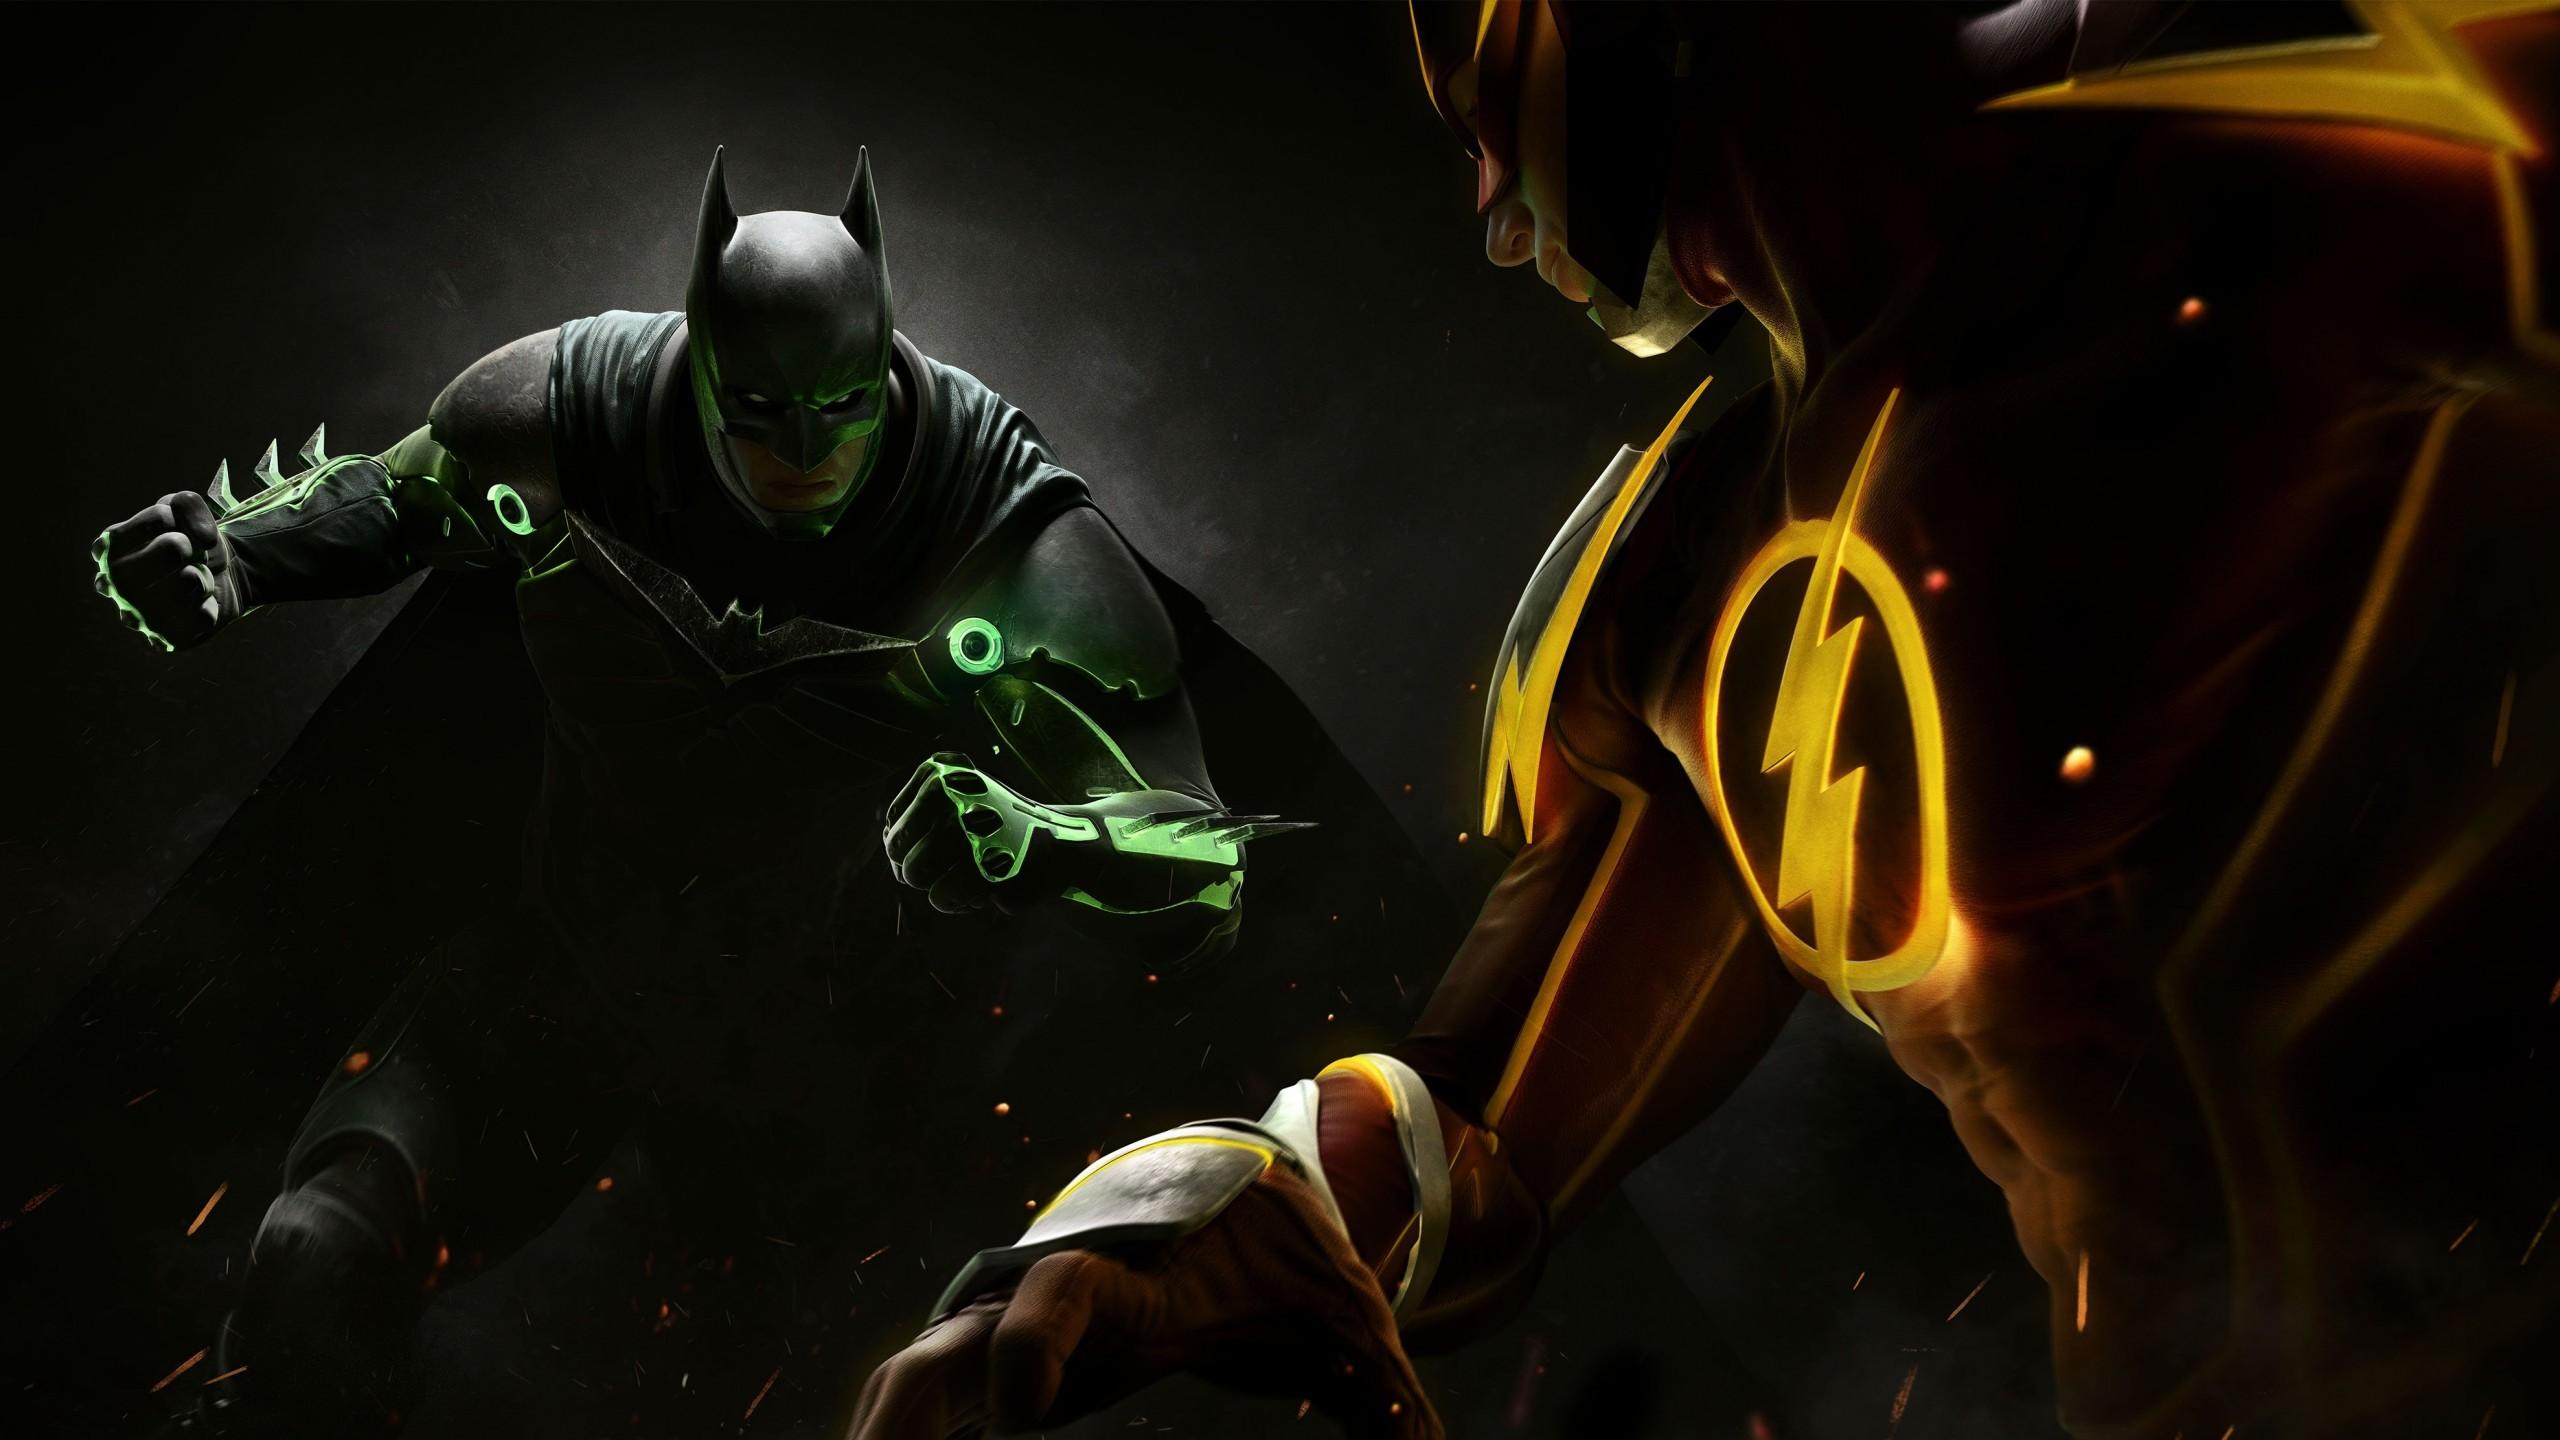 Wallpaper Injustice 2 Batman Superman Fighting PC PlayStation